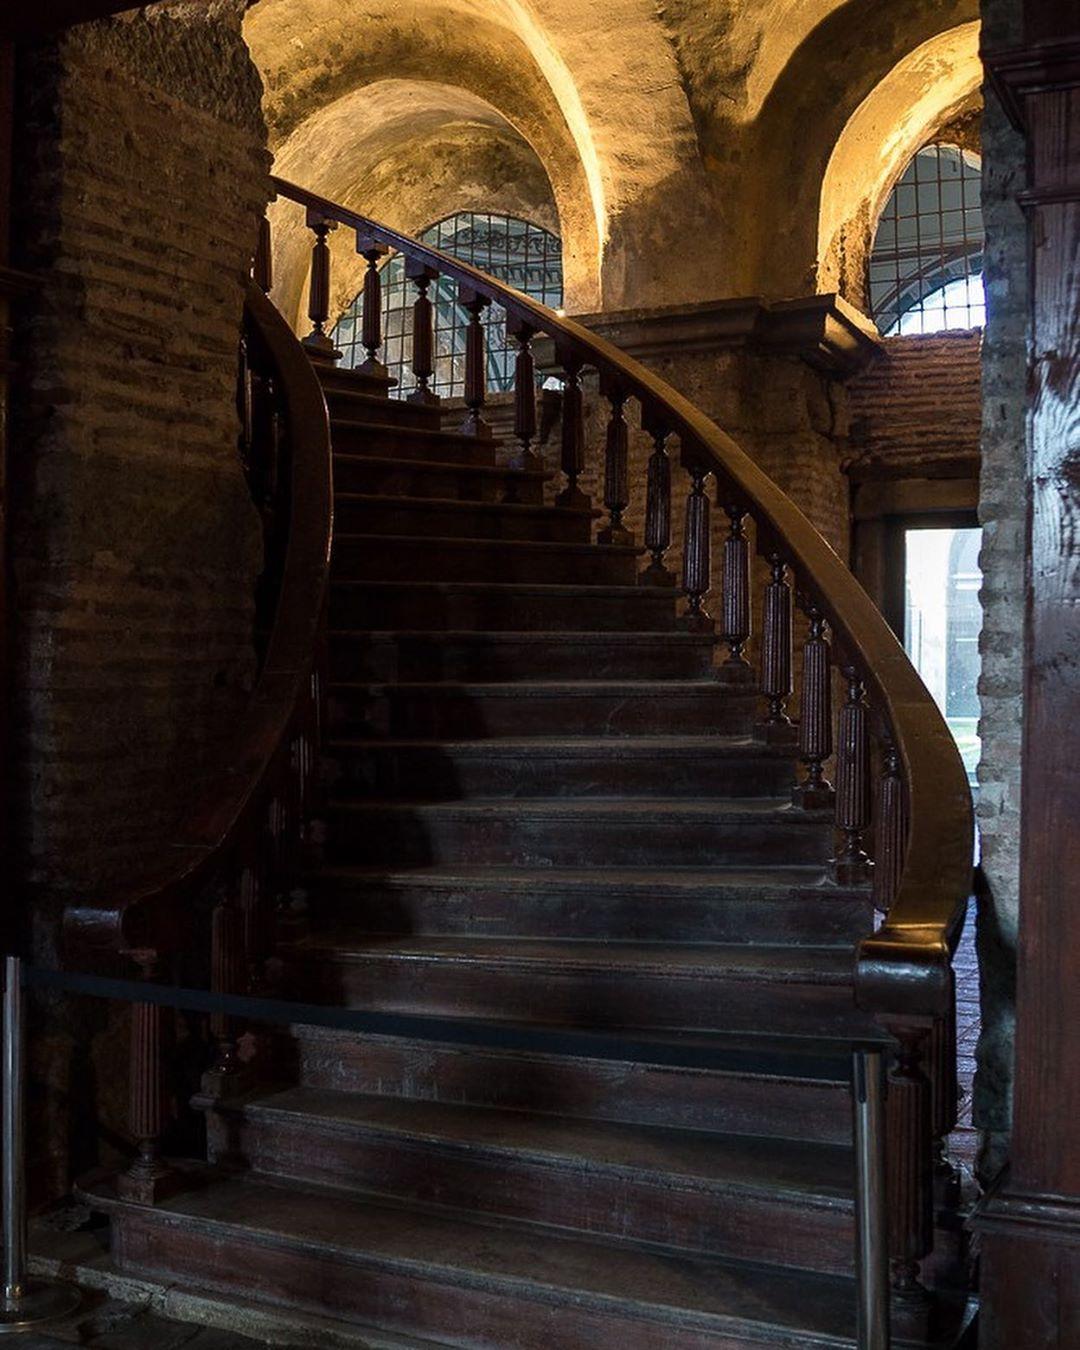 Entrance Fee to Hagia Eirene Church 2020